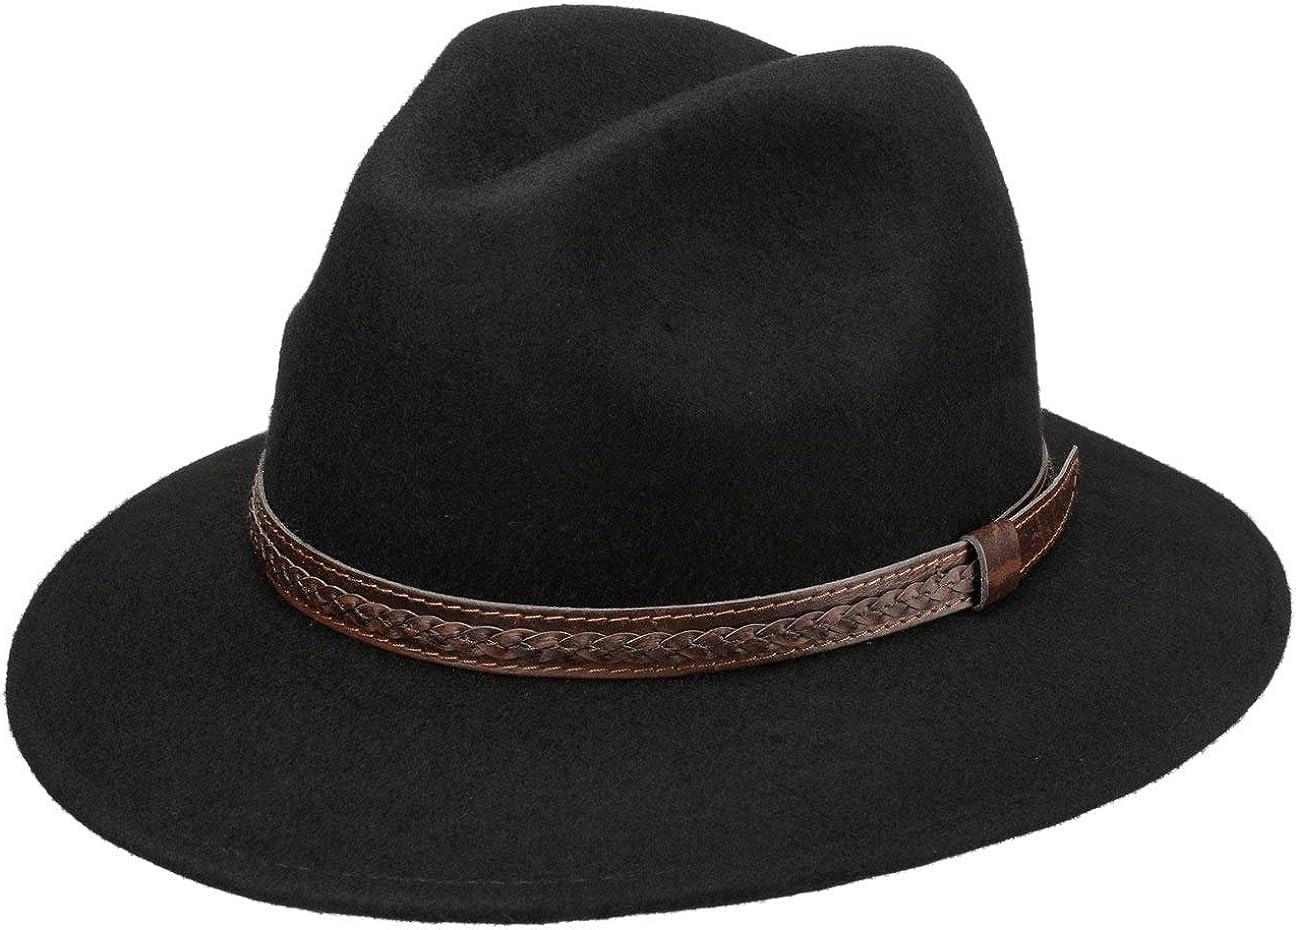 Lipodo Sombrero de Lana Kentucky Mujer/Hombre - Made in Italy Sombreros Hombre Fieltro con Banda Piel Verano/Invierno